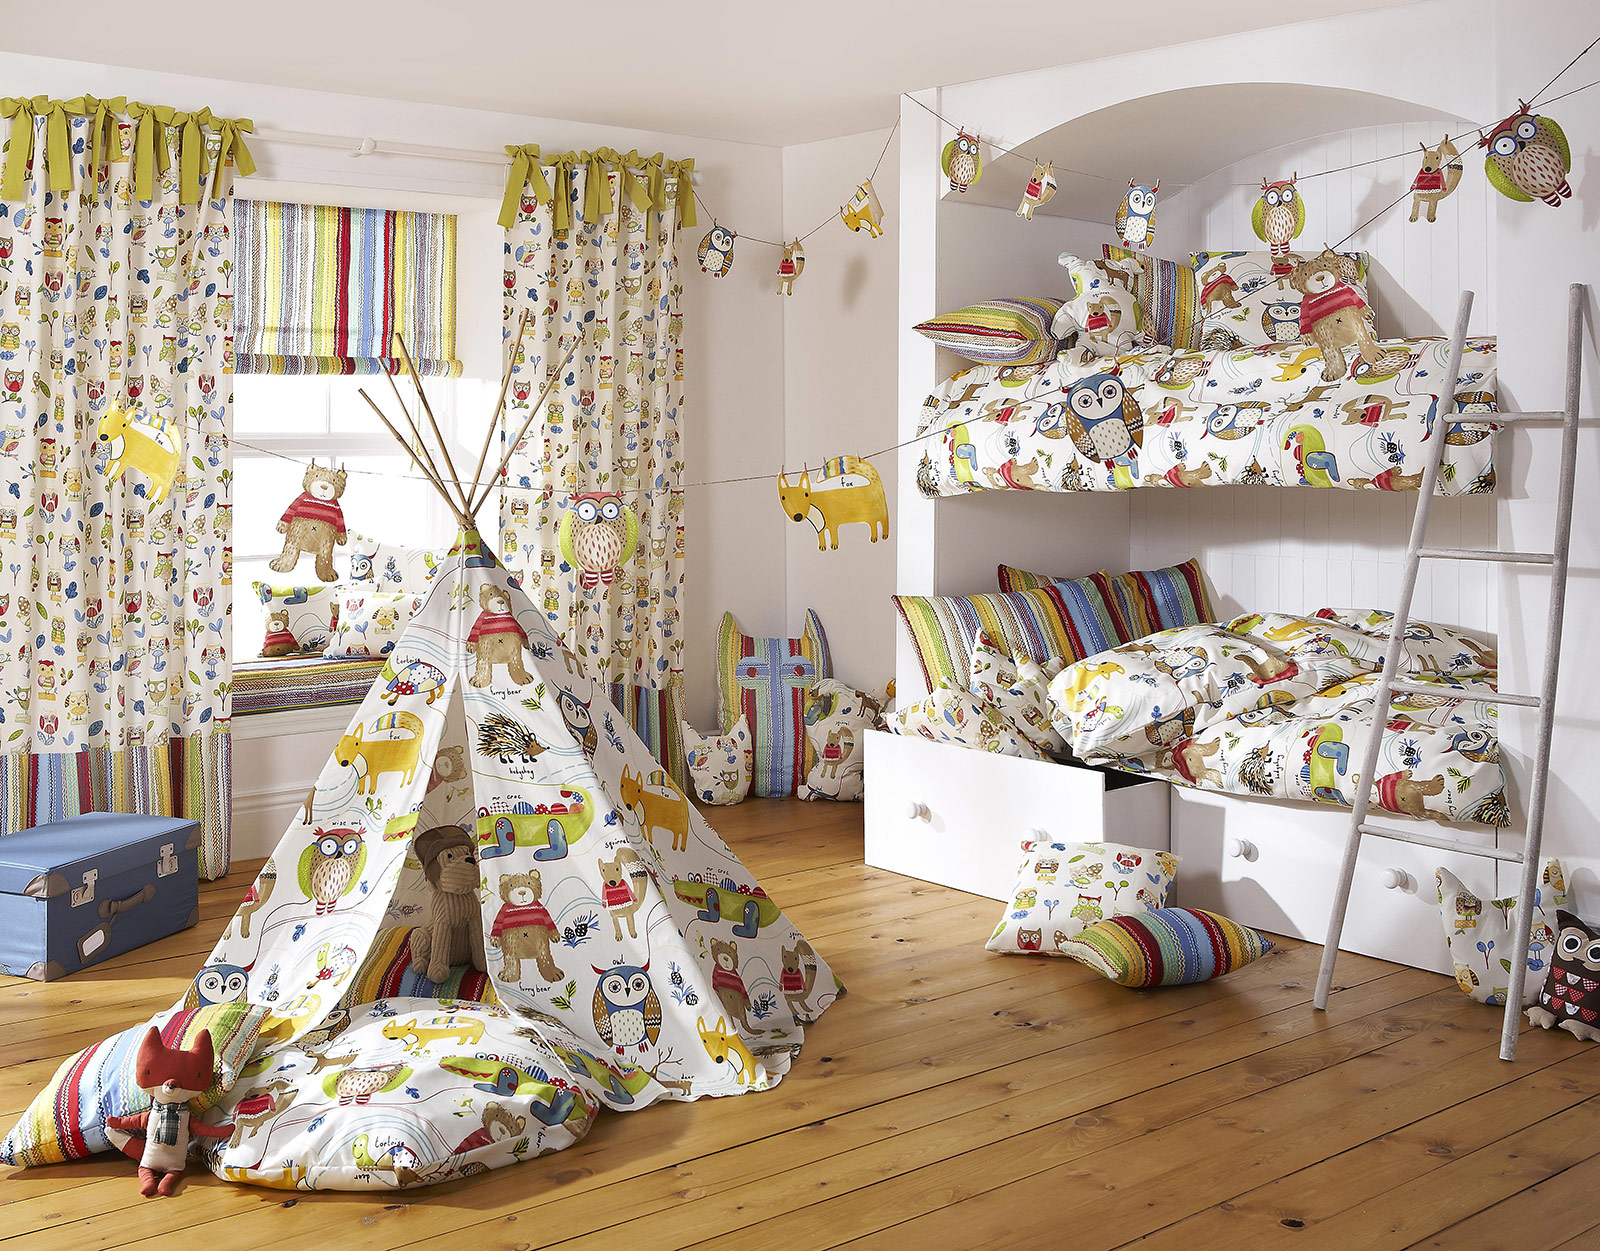 Full Size of Regal Kinderzimmer Regale Sofa Vorhang Wohnzimmer Bad Weiß Küche Kinderzimmer Kinderzimmer Vorhang